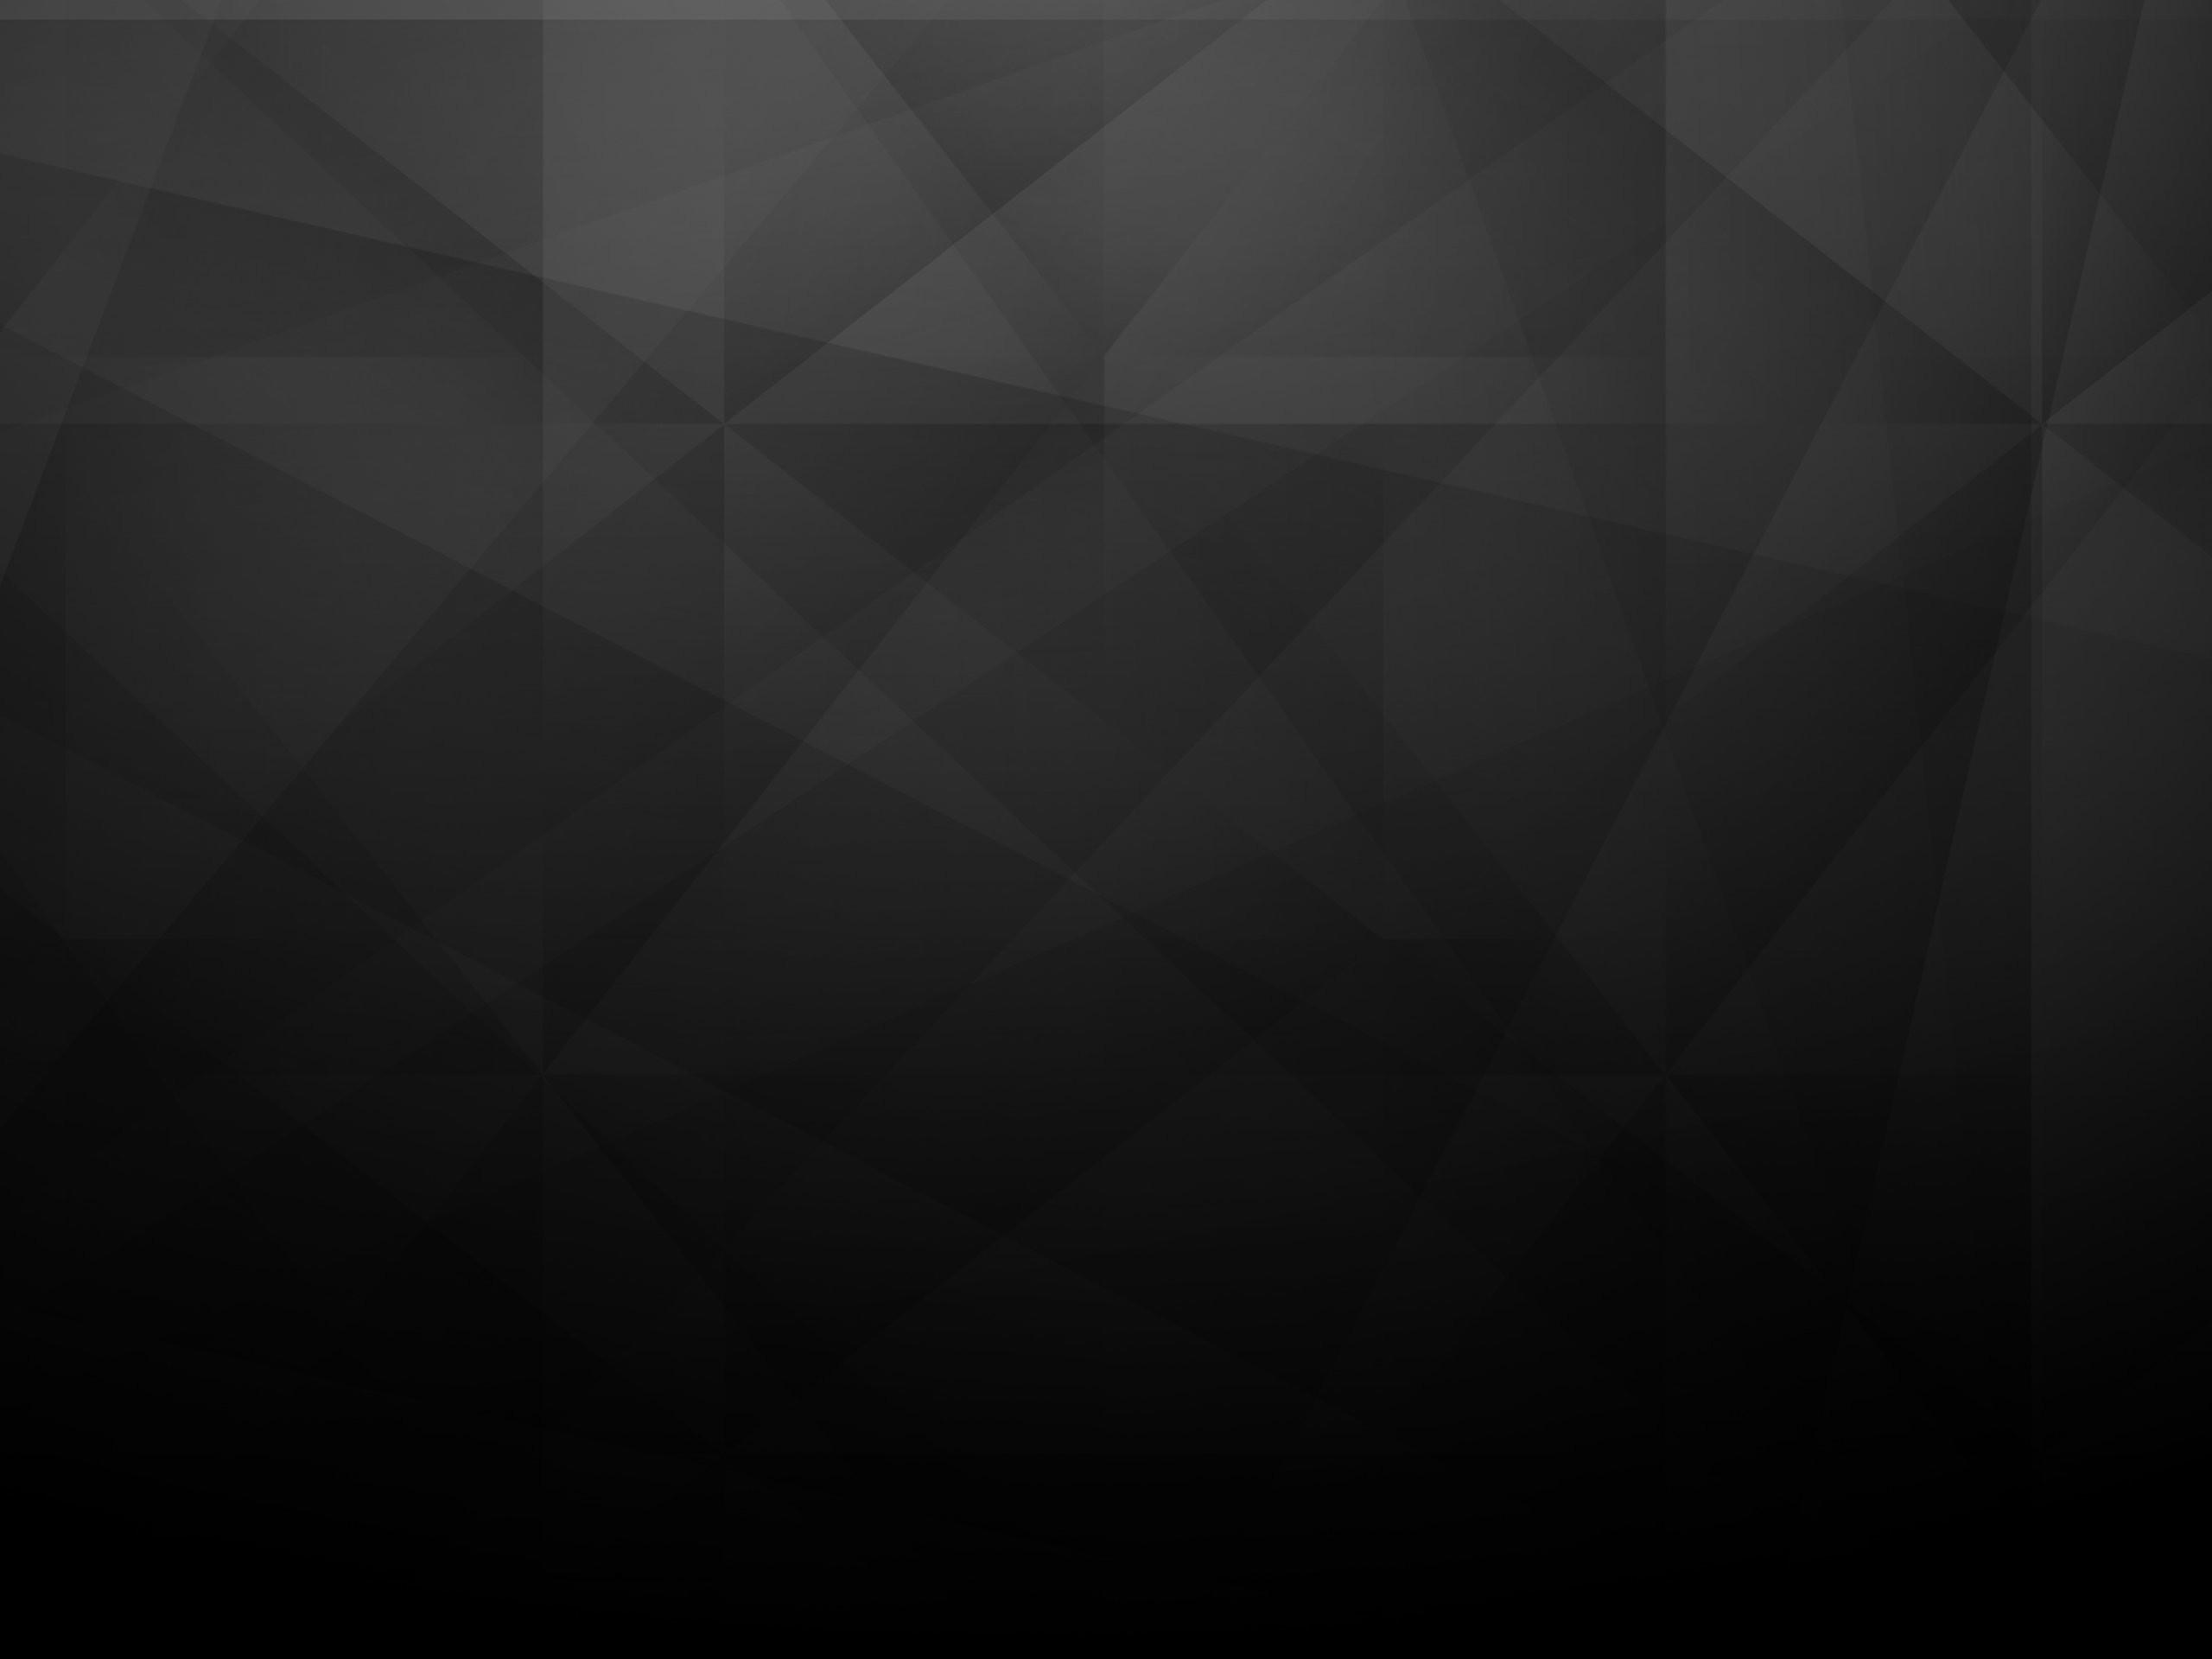 Black HD Wallpapers p Widescreen